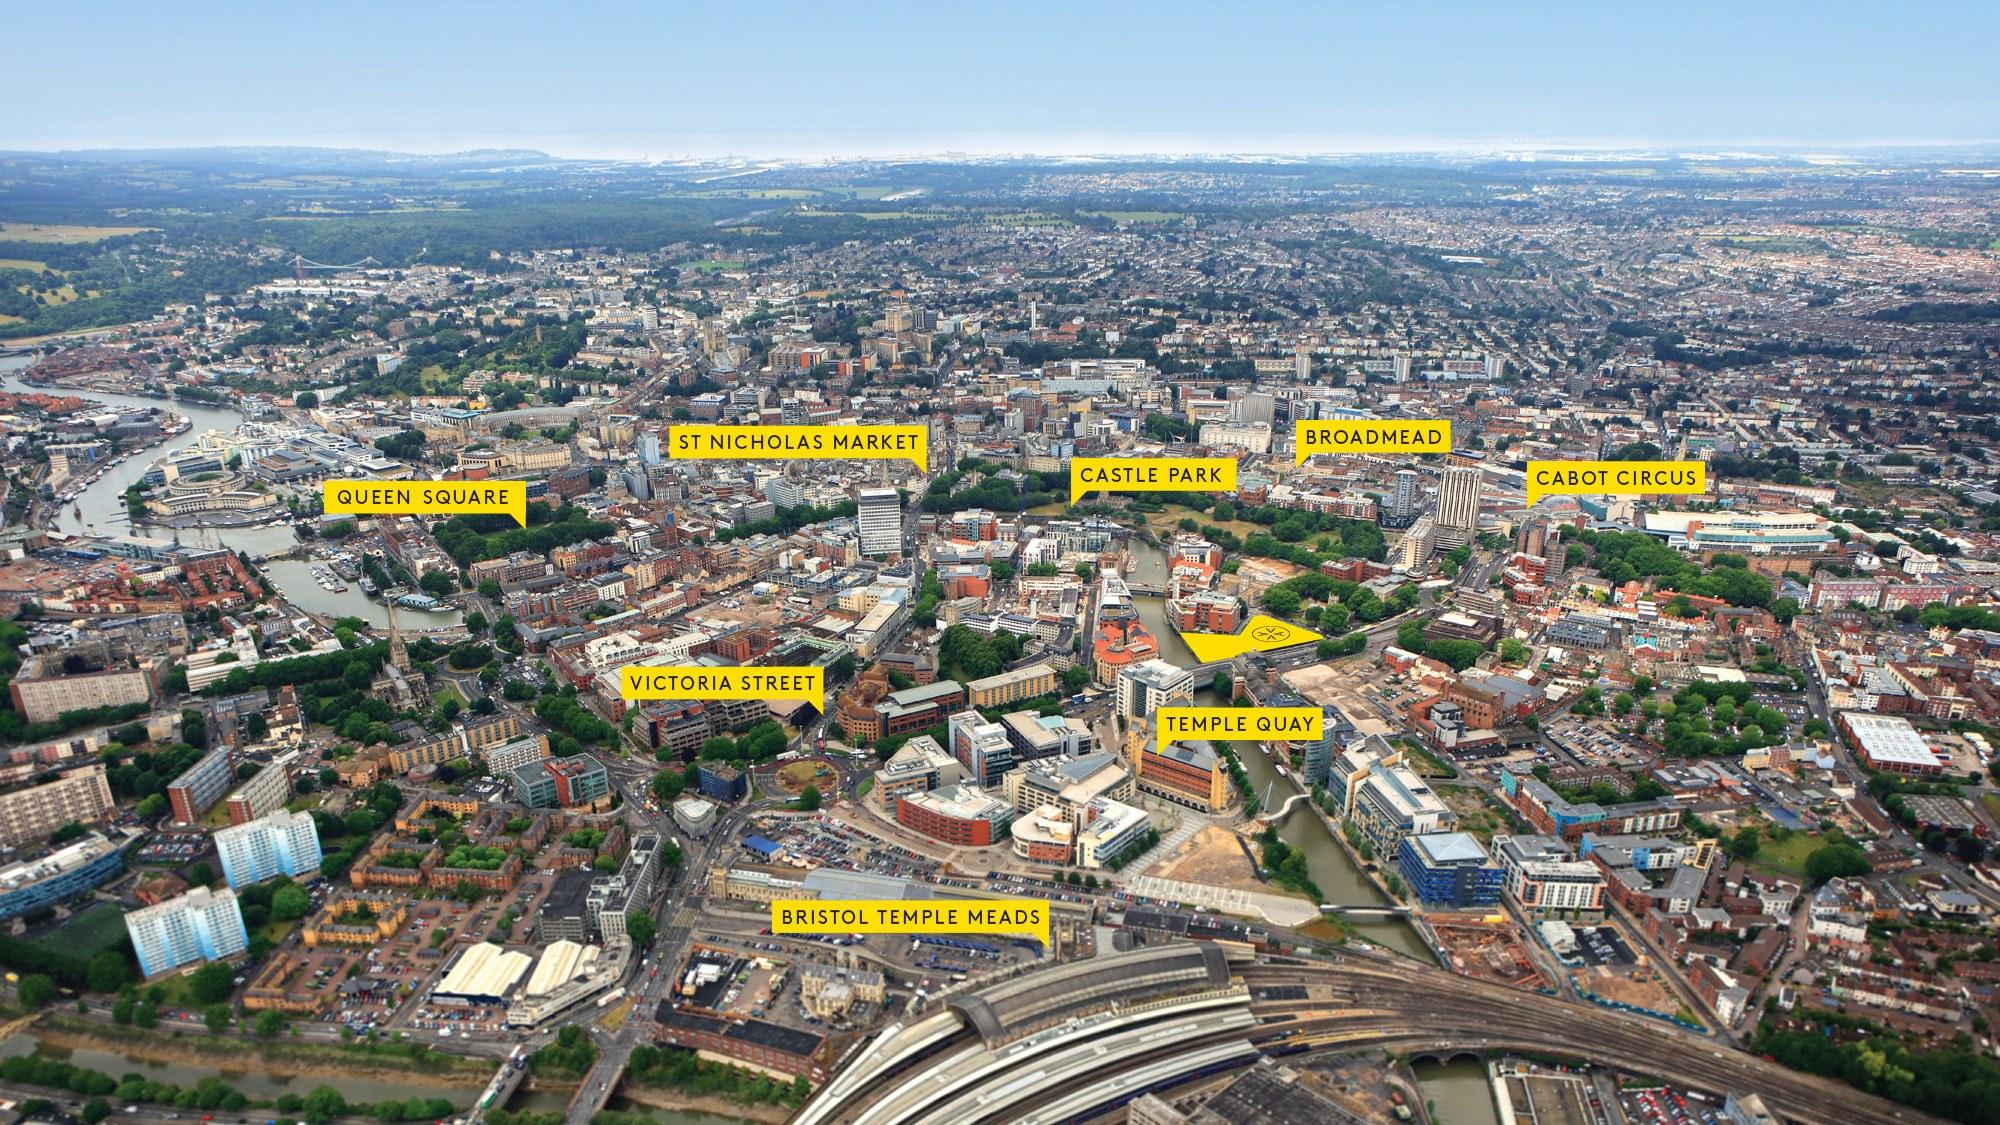 Ab Map Image Edit